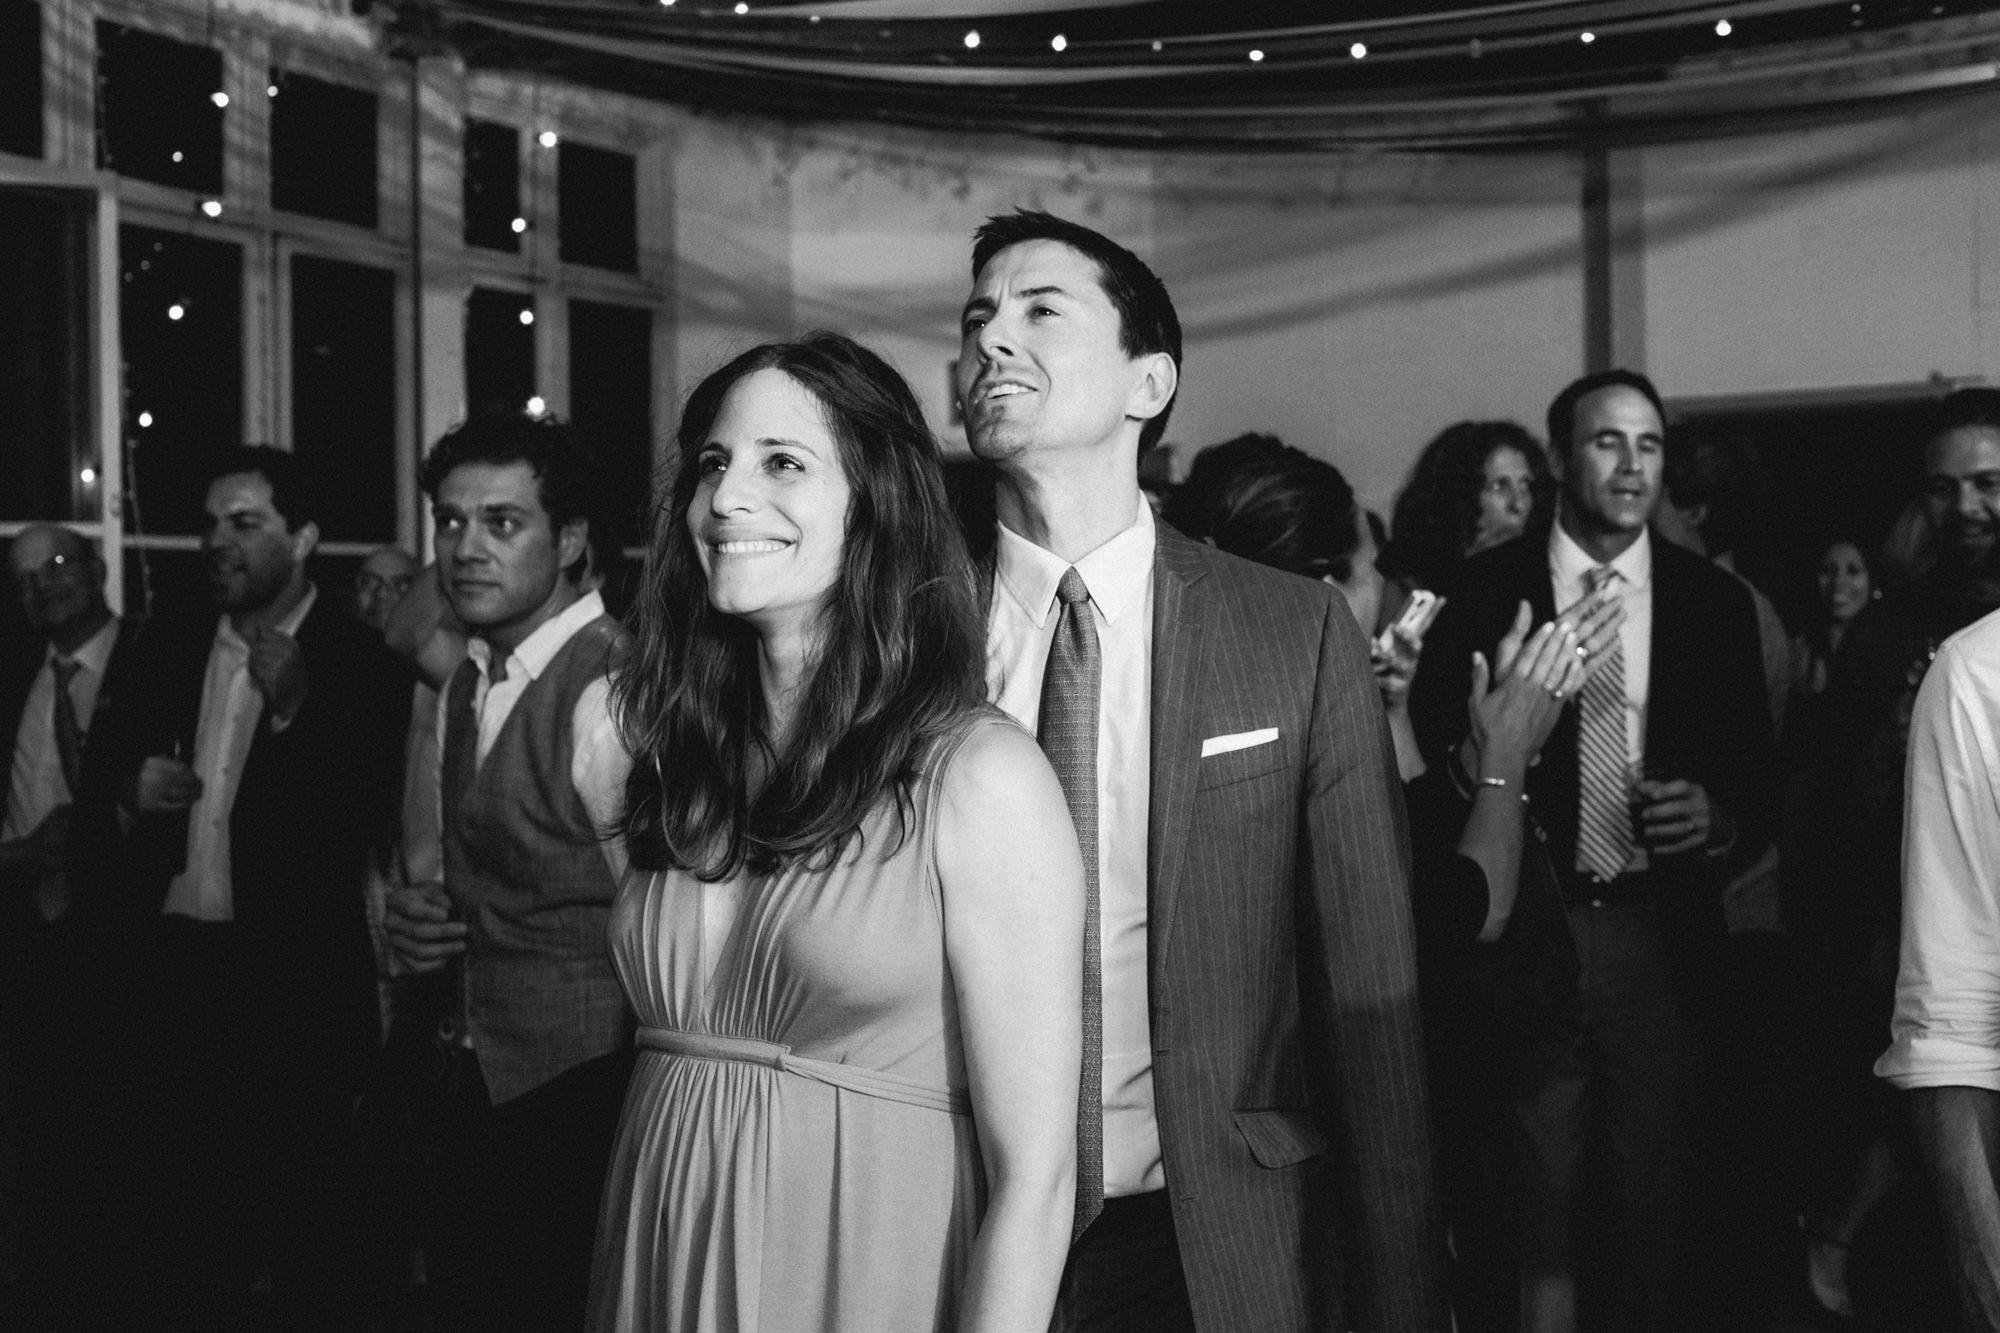 catskills_big_indian_springs_upstate_NY_wedding_sammblake134.jpg